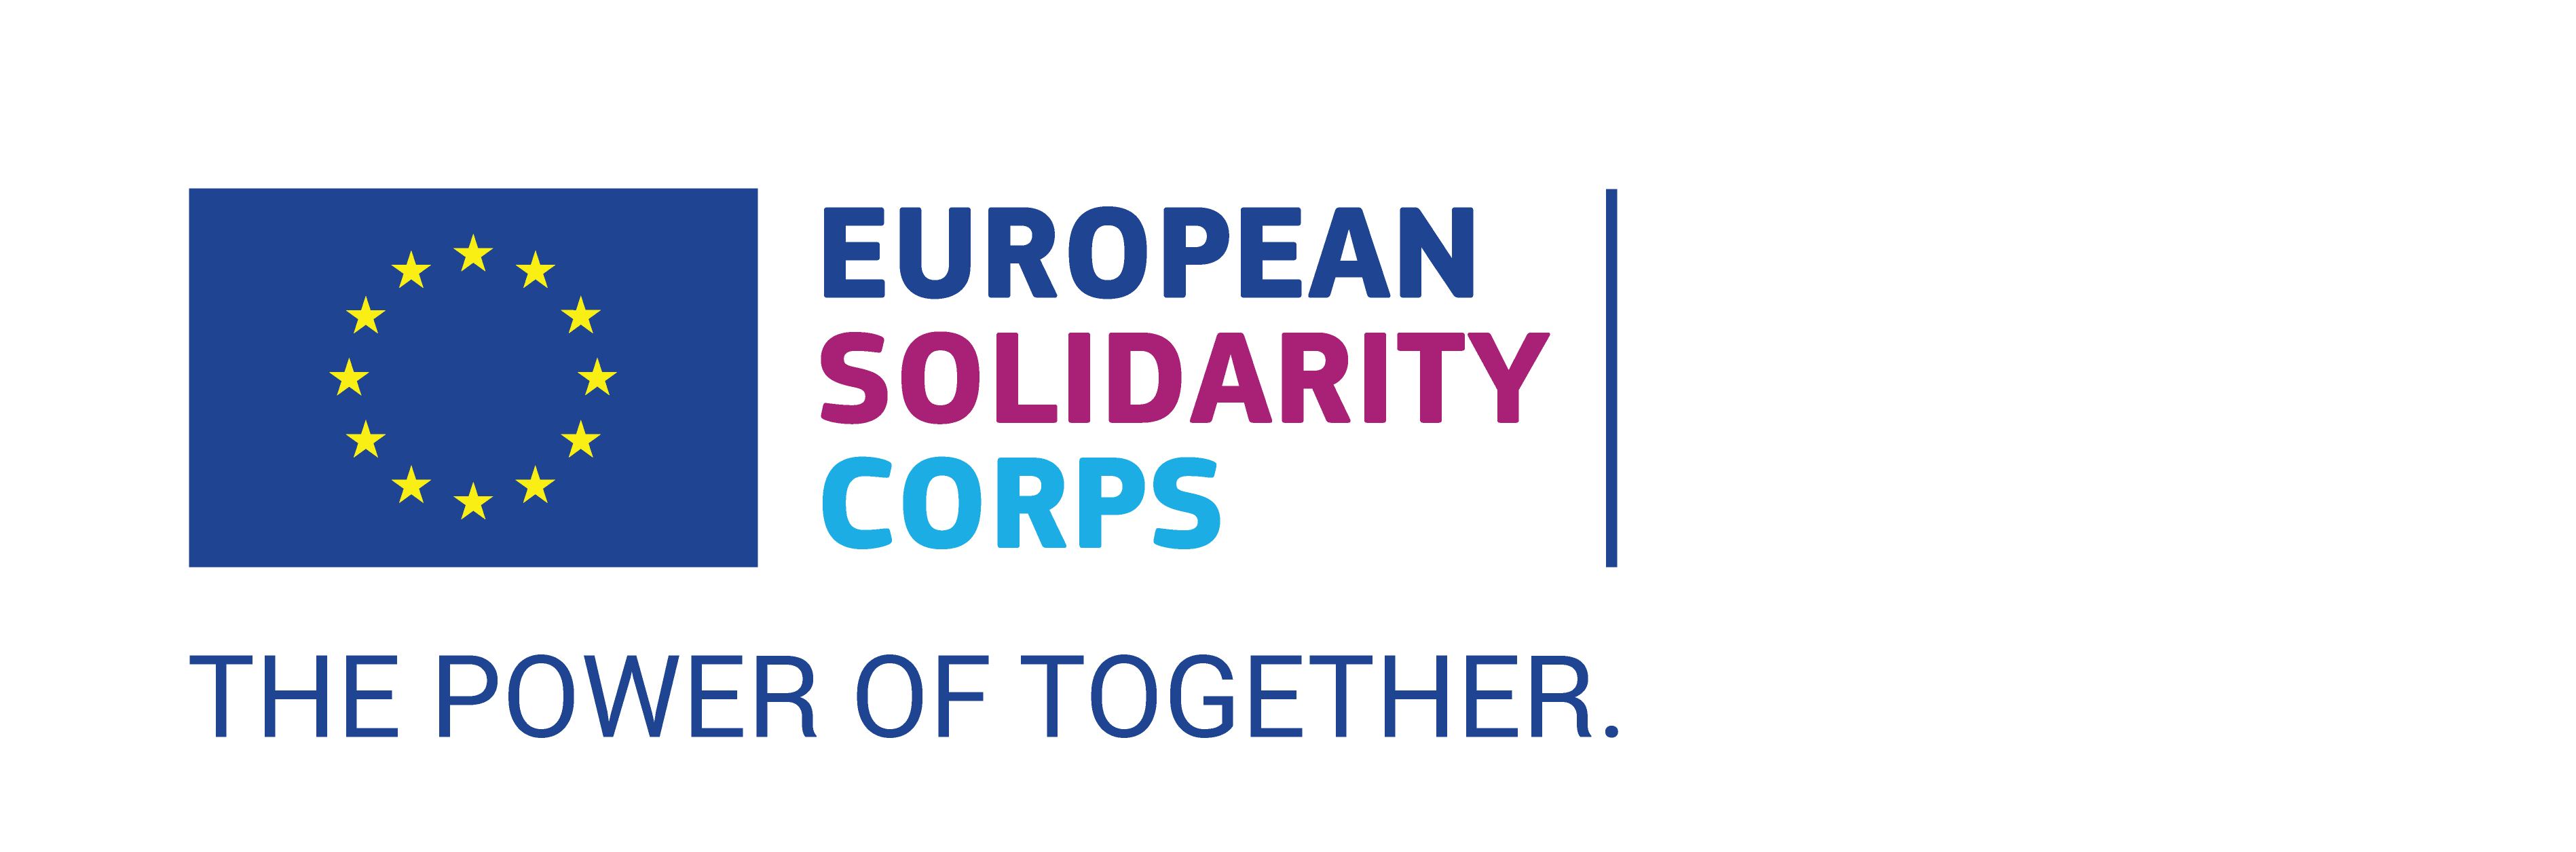 europeansoftball.org